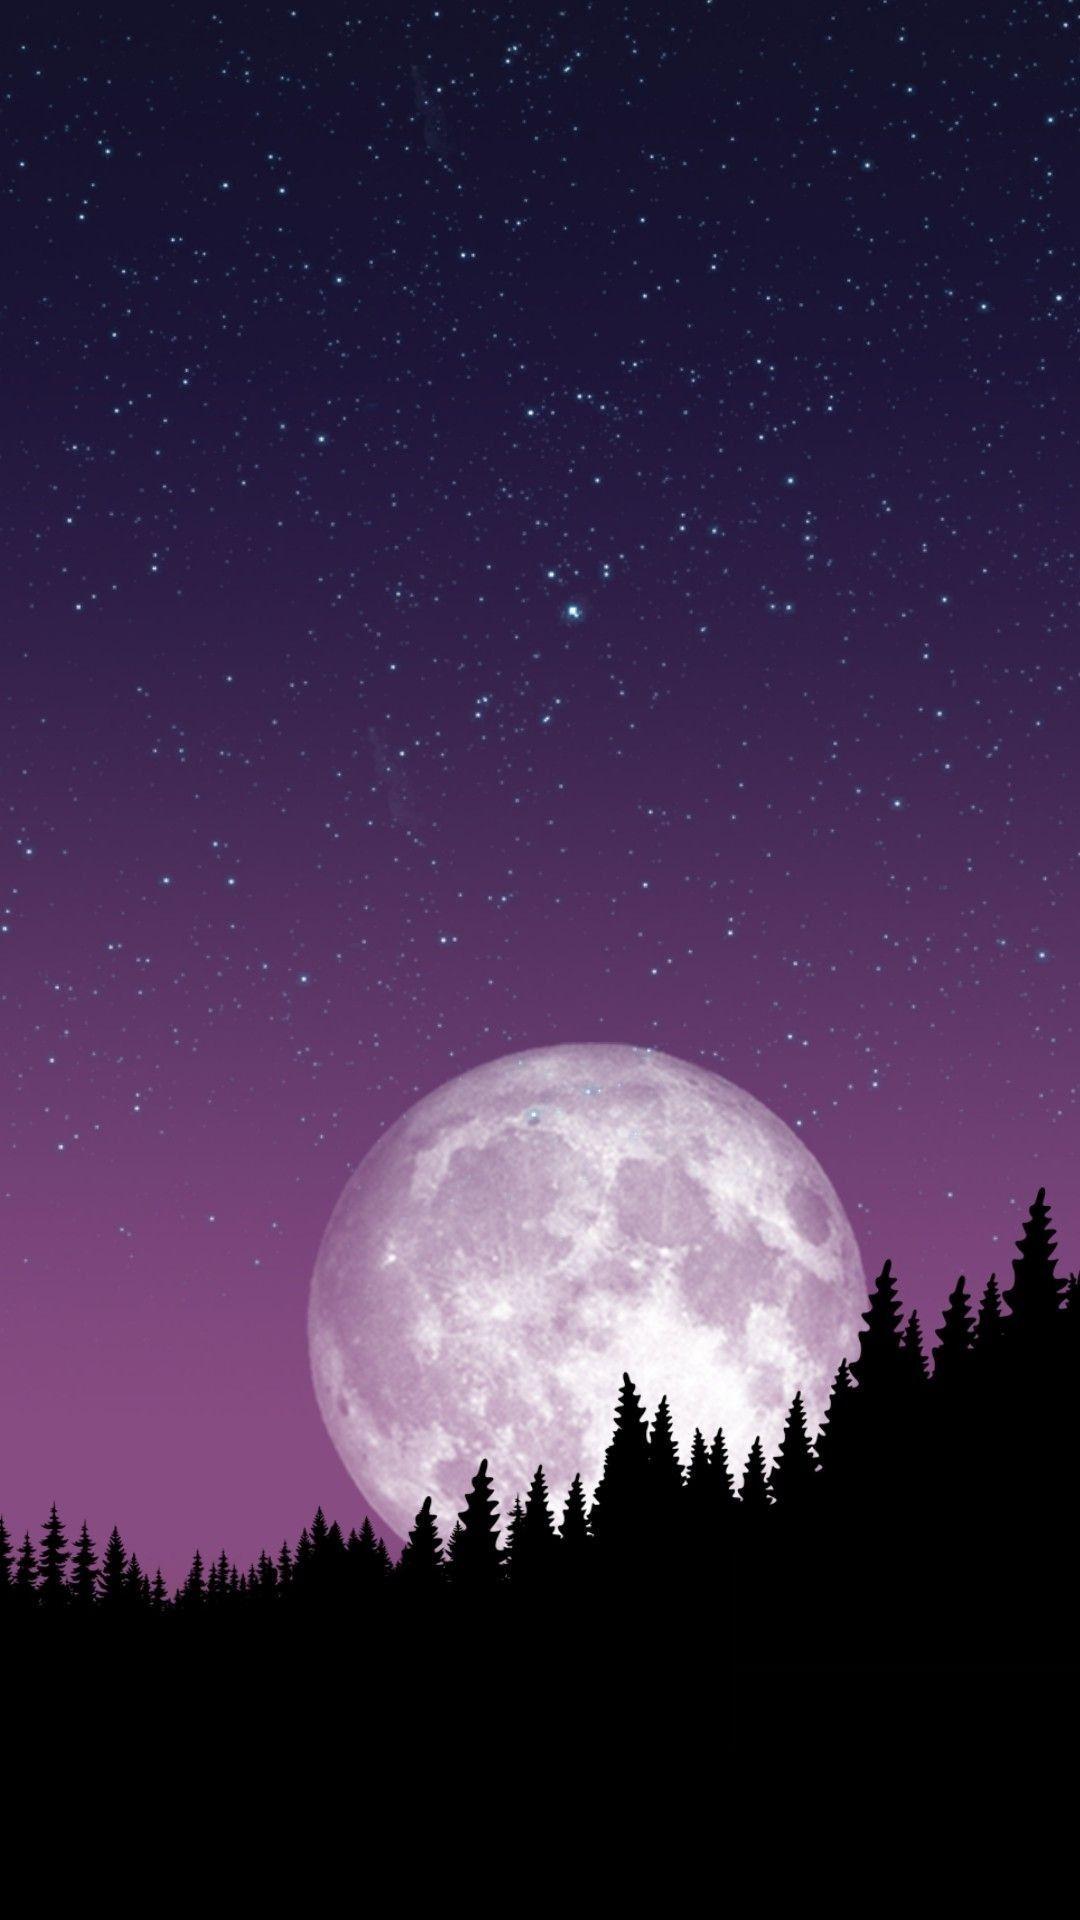 Biggest Light Earth Night Sky Wallpaper Dark Wallpaper Beautiful Moon